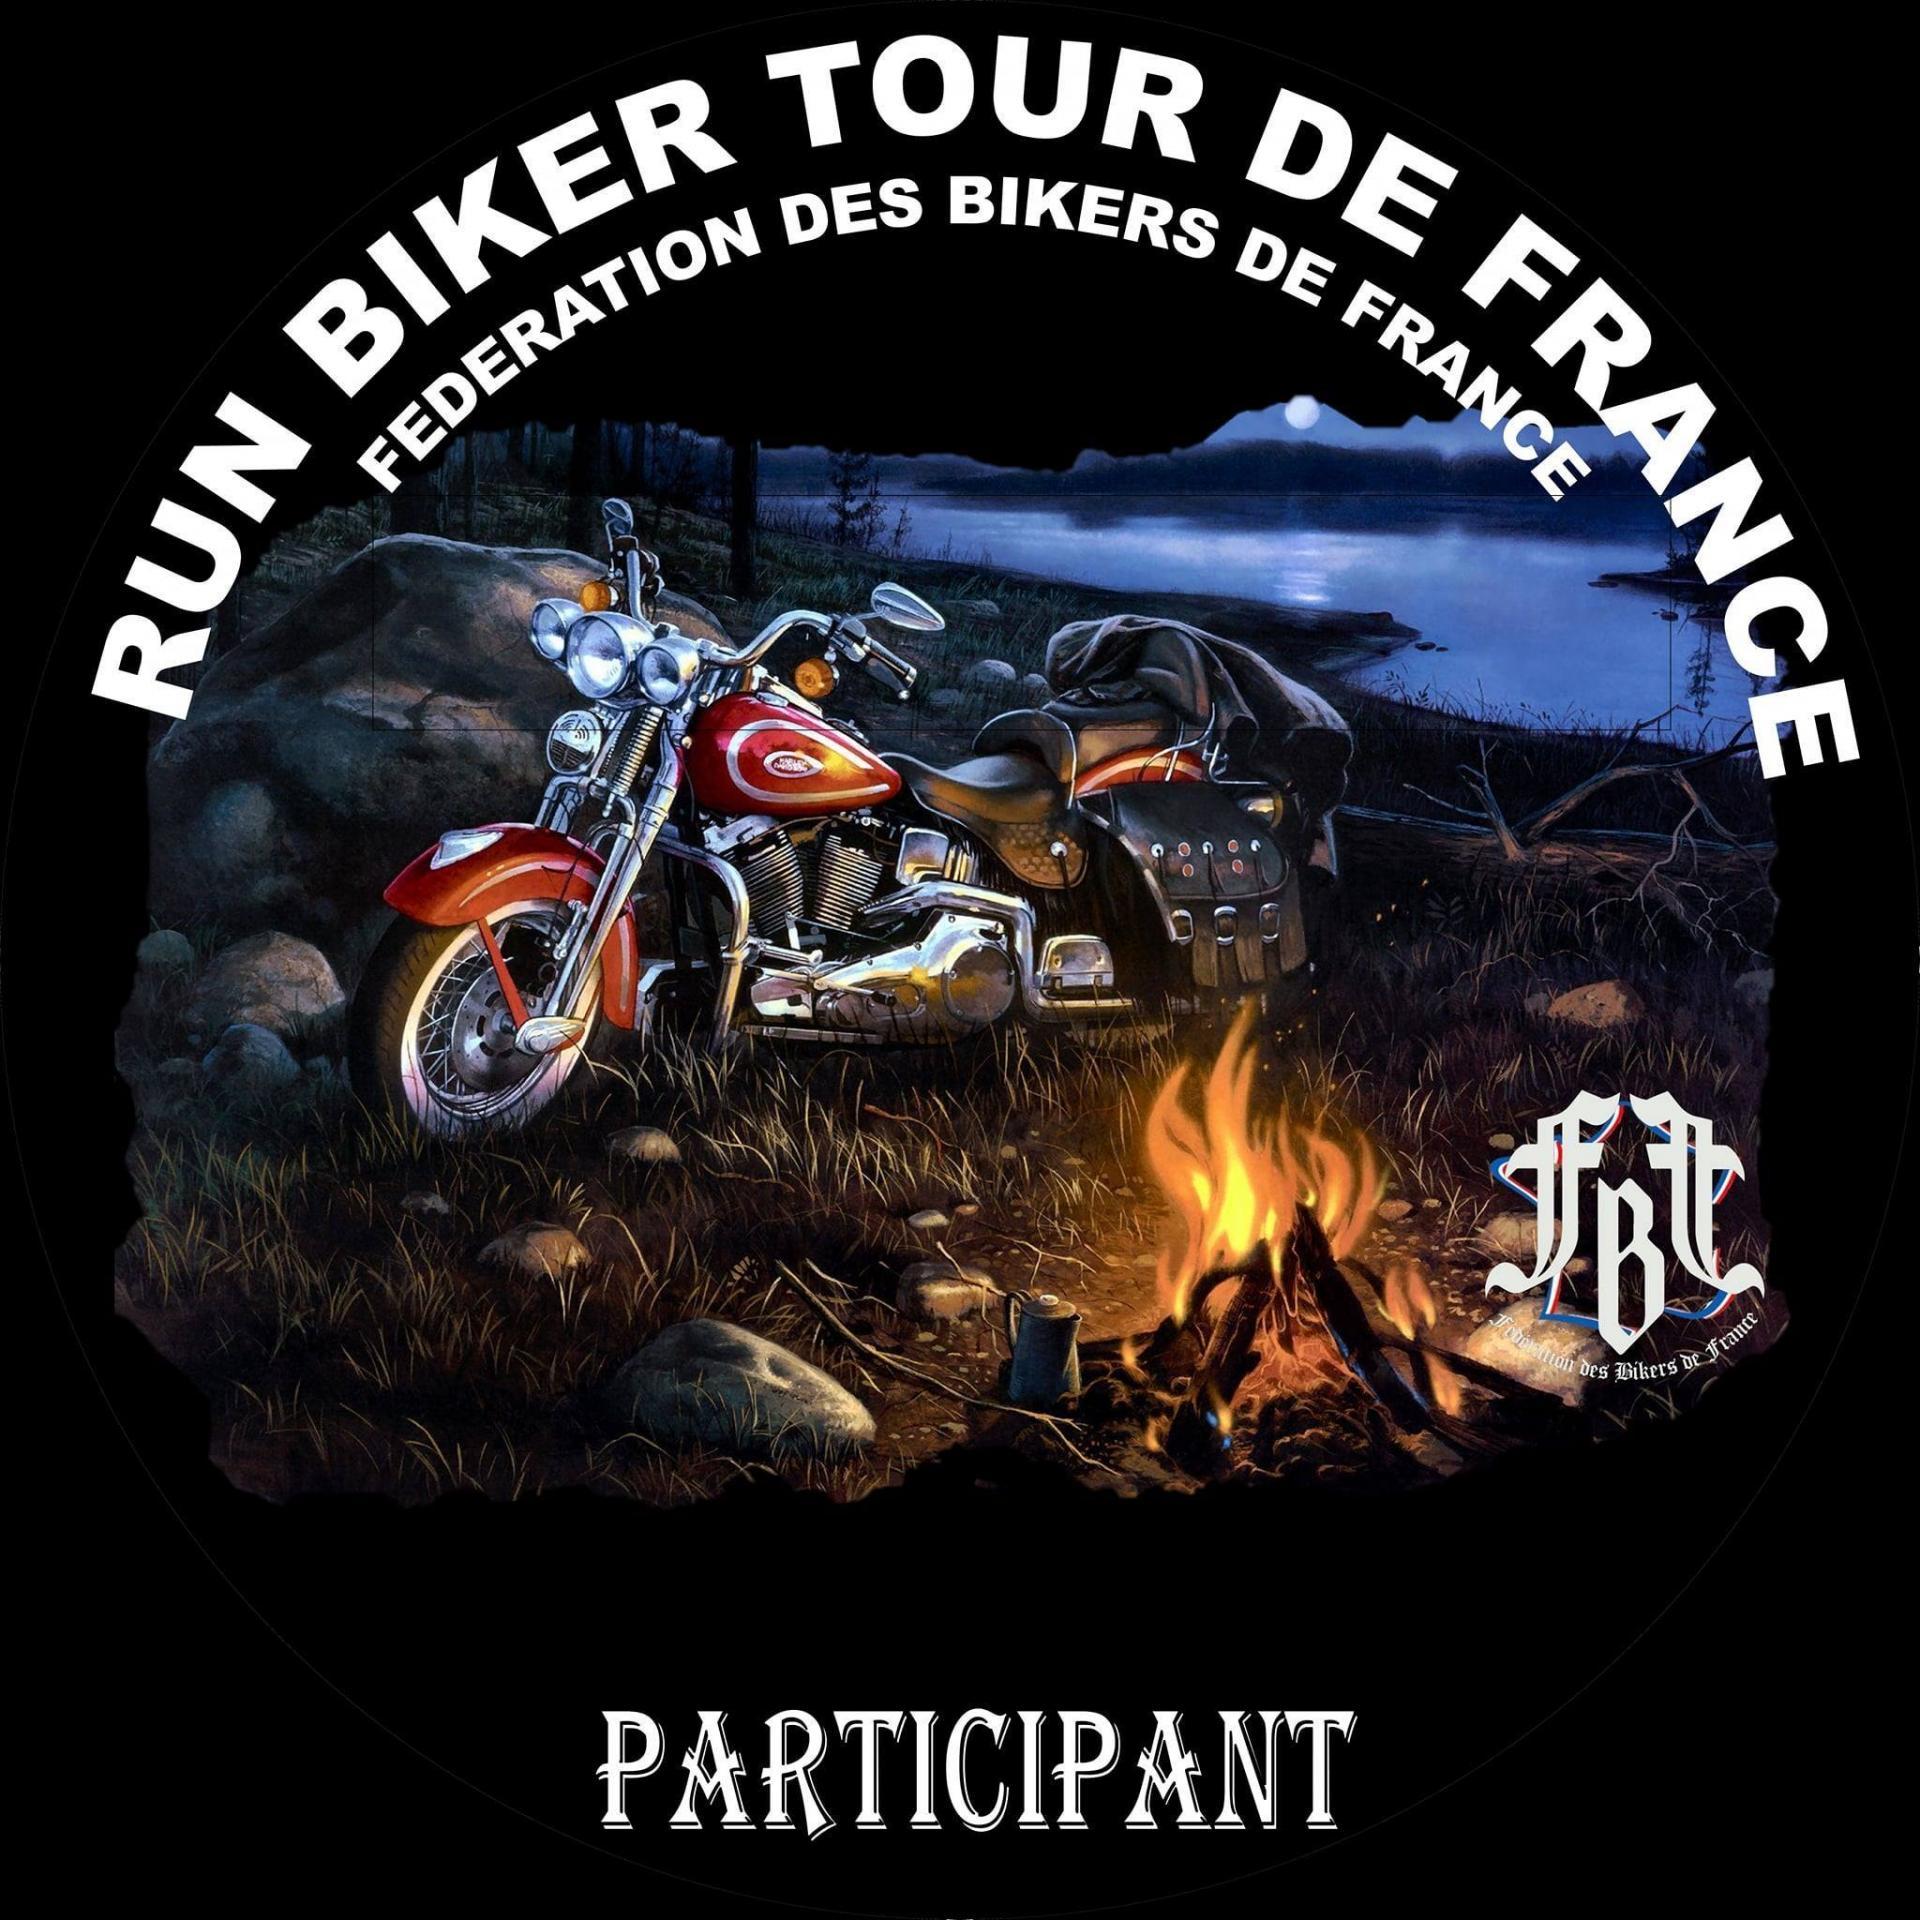 Run biker participant